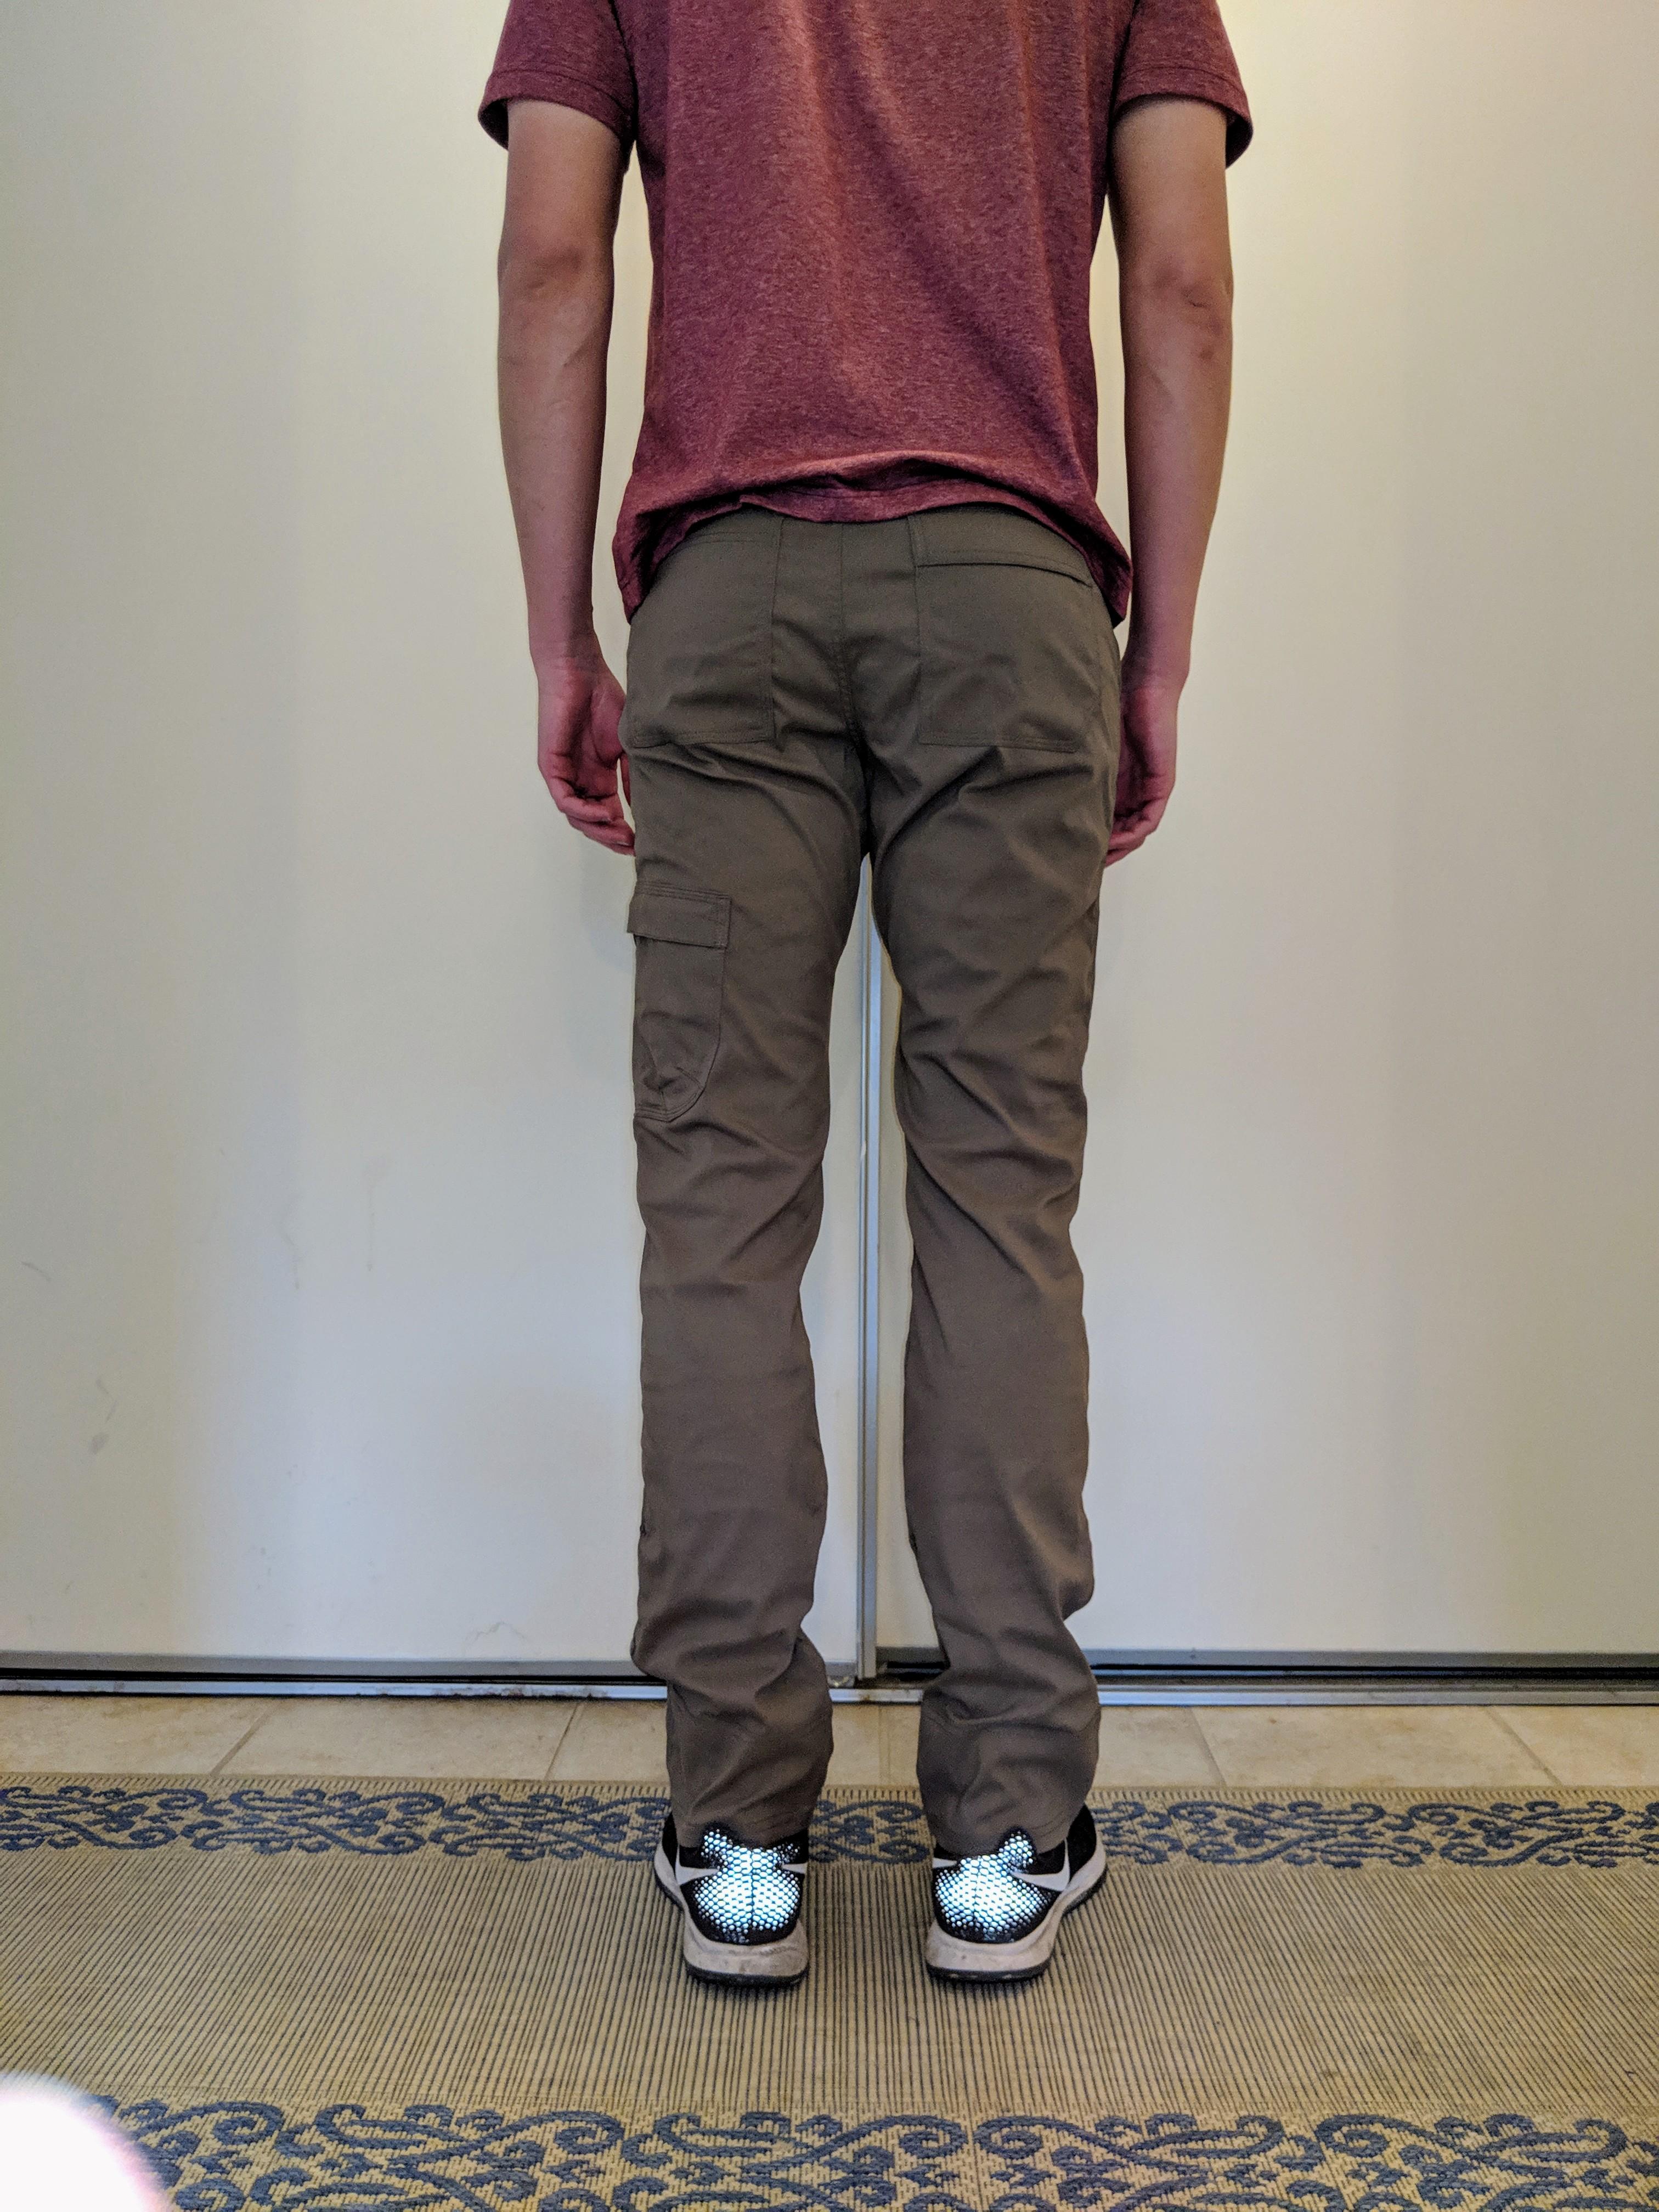 262c9c257336ef prAna men's hiking pants review – Backpackers Review